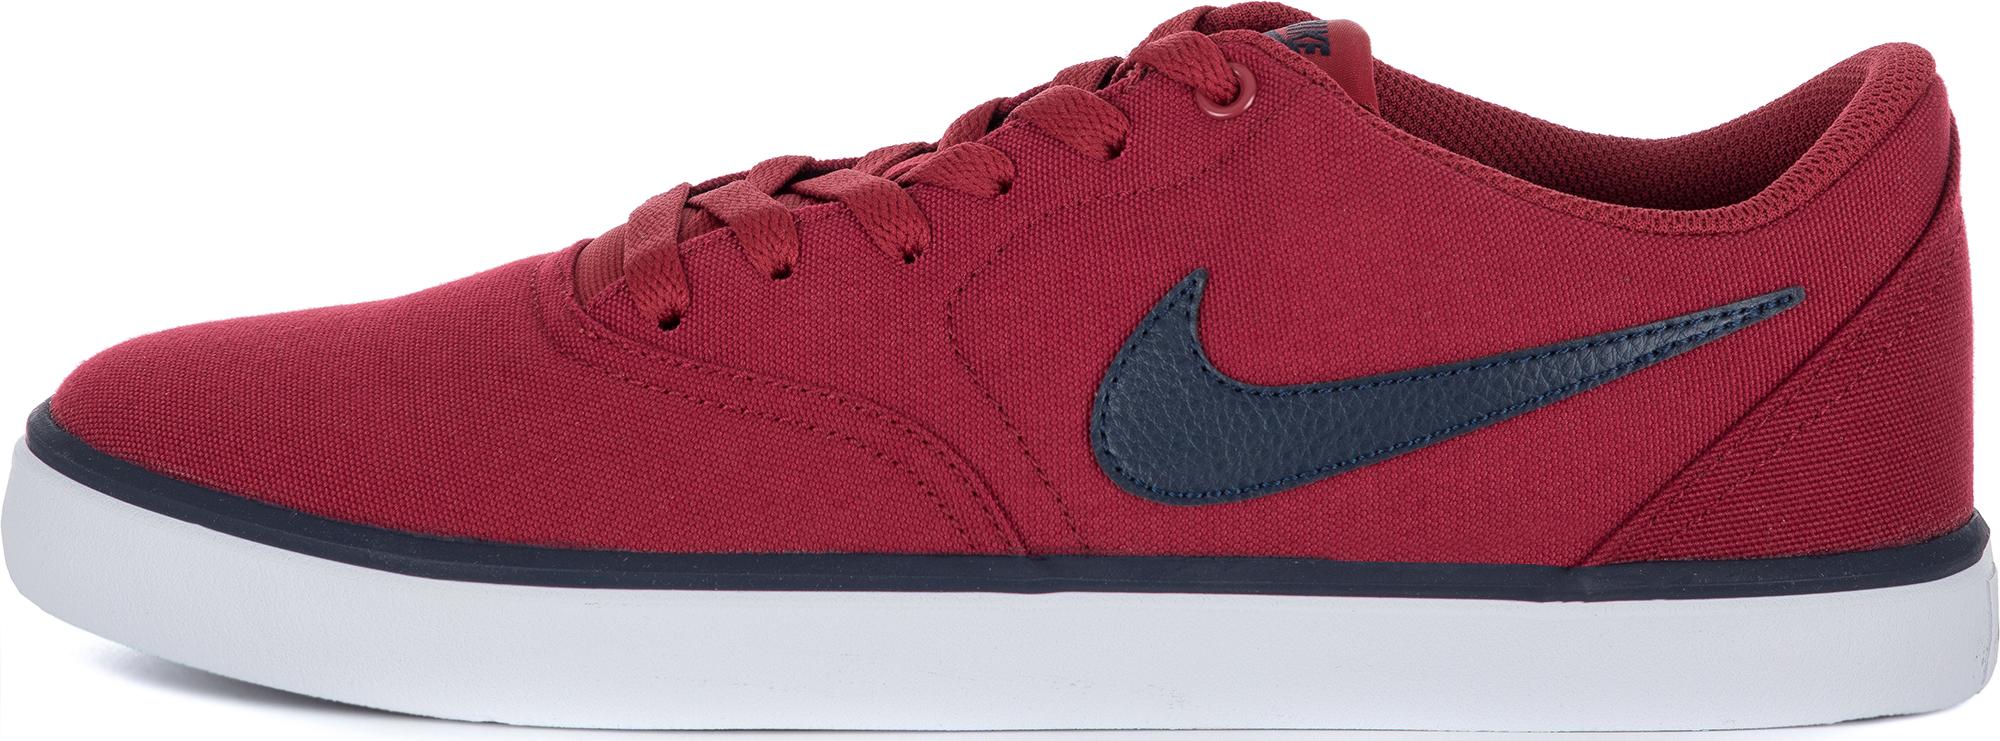 Nike Кеды мужские Nike Sb Check Solar Cnvs, размер 44 nike боксерки мужские nike machomai размер 44